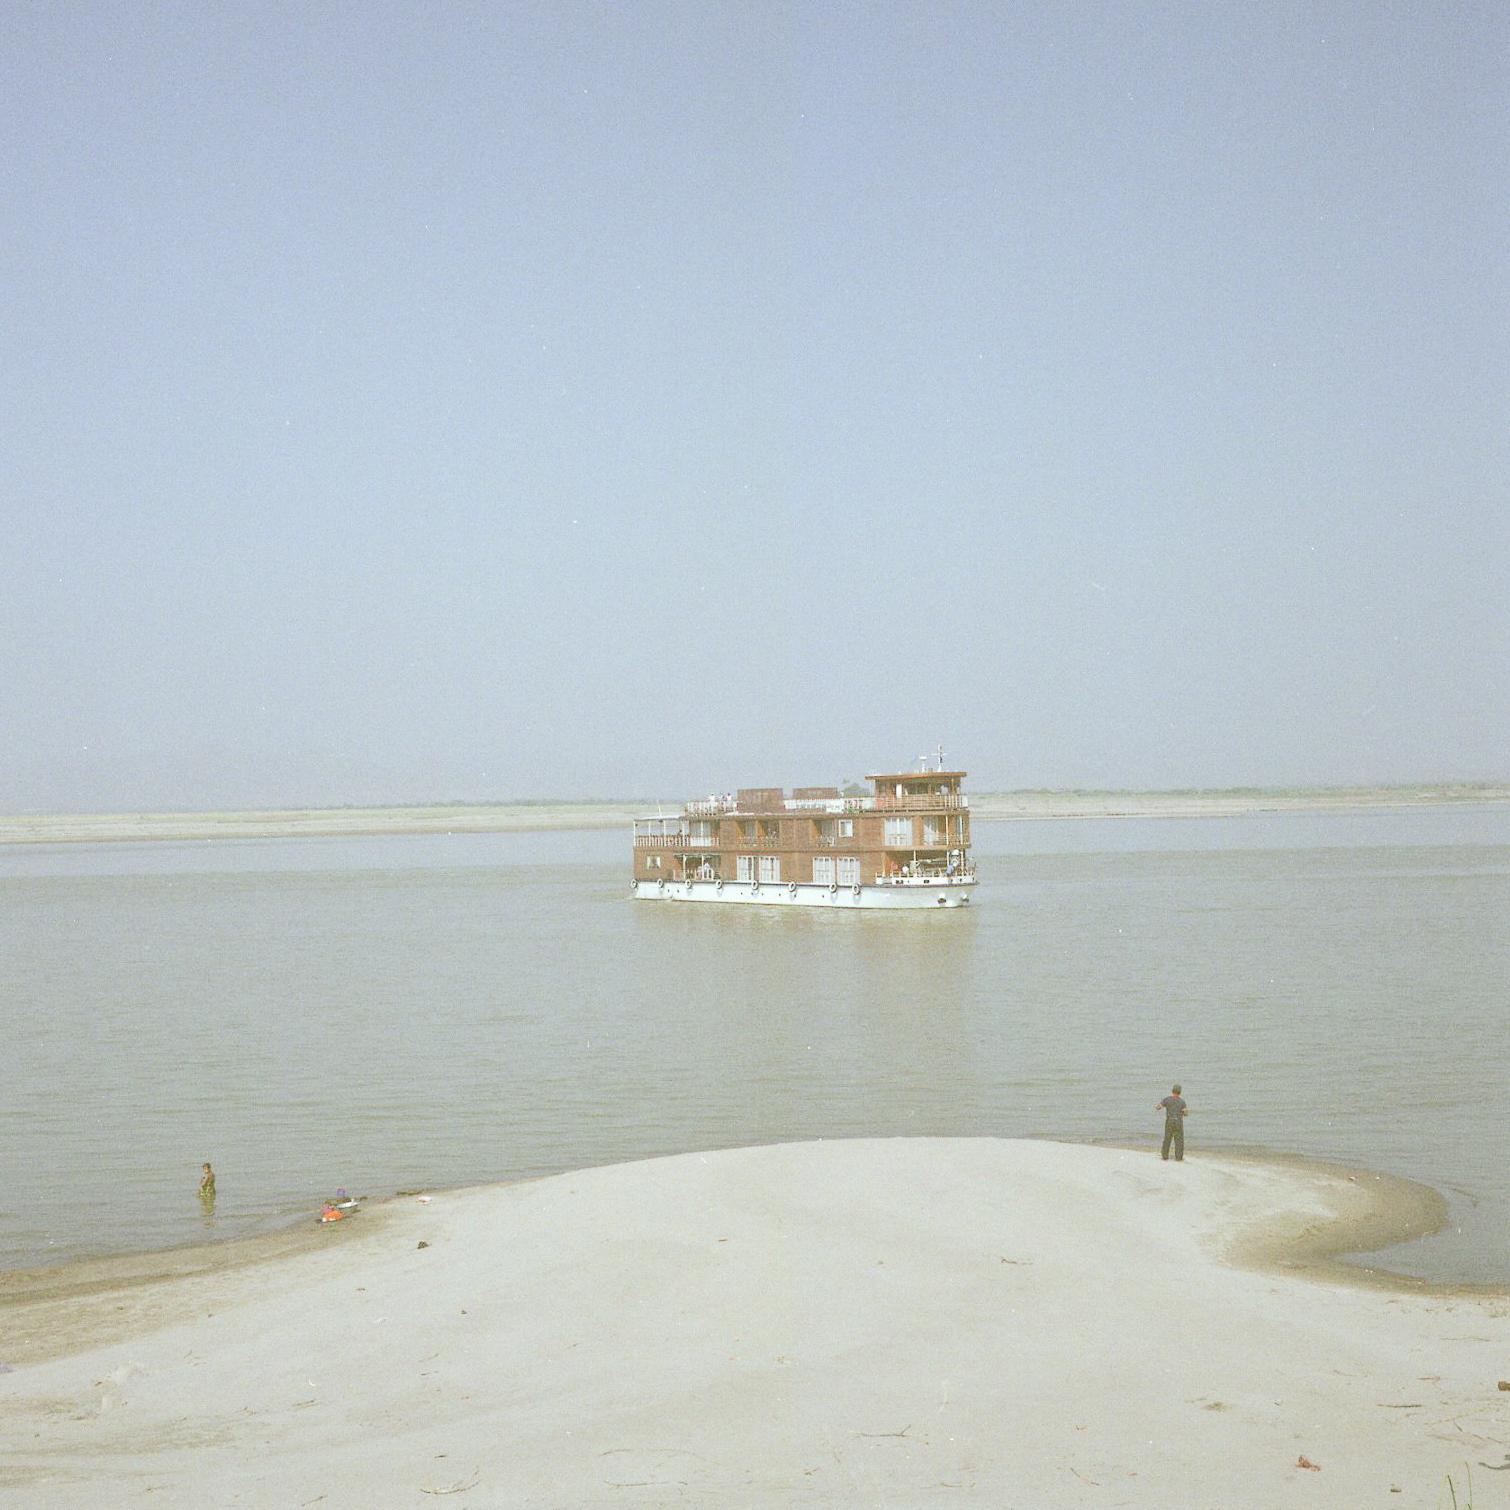 Myanmar-Irrawaddy_11